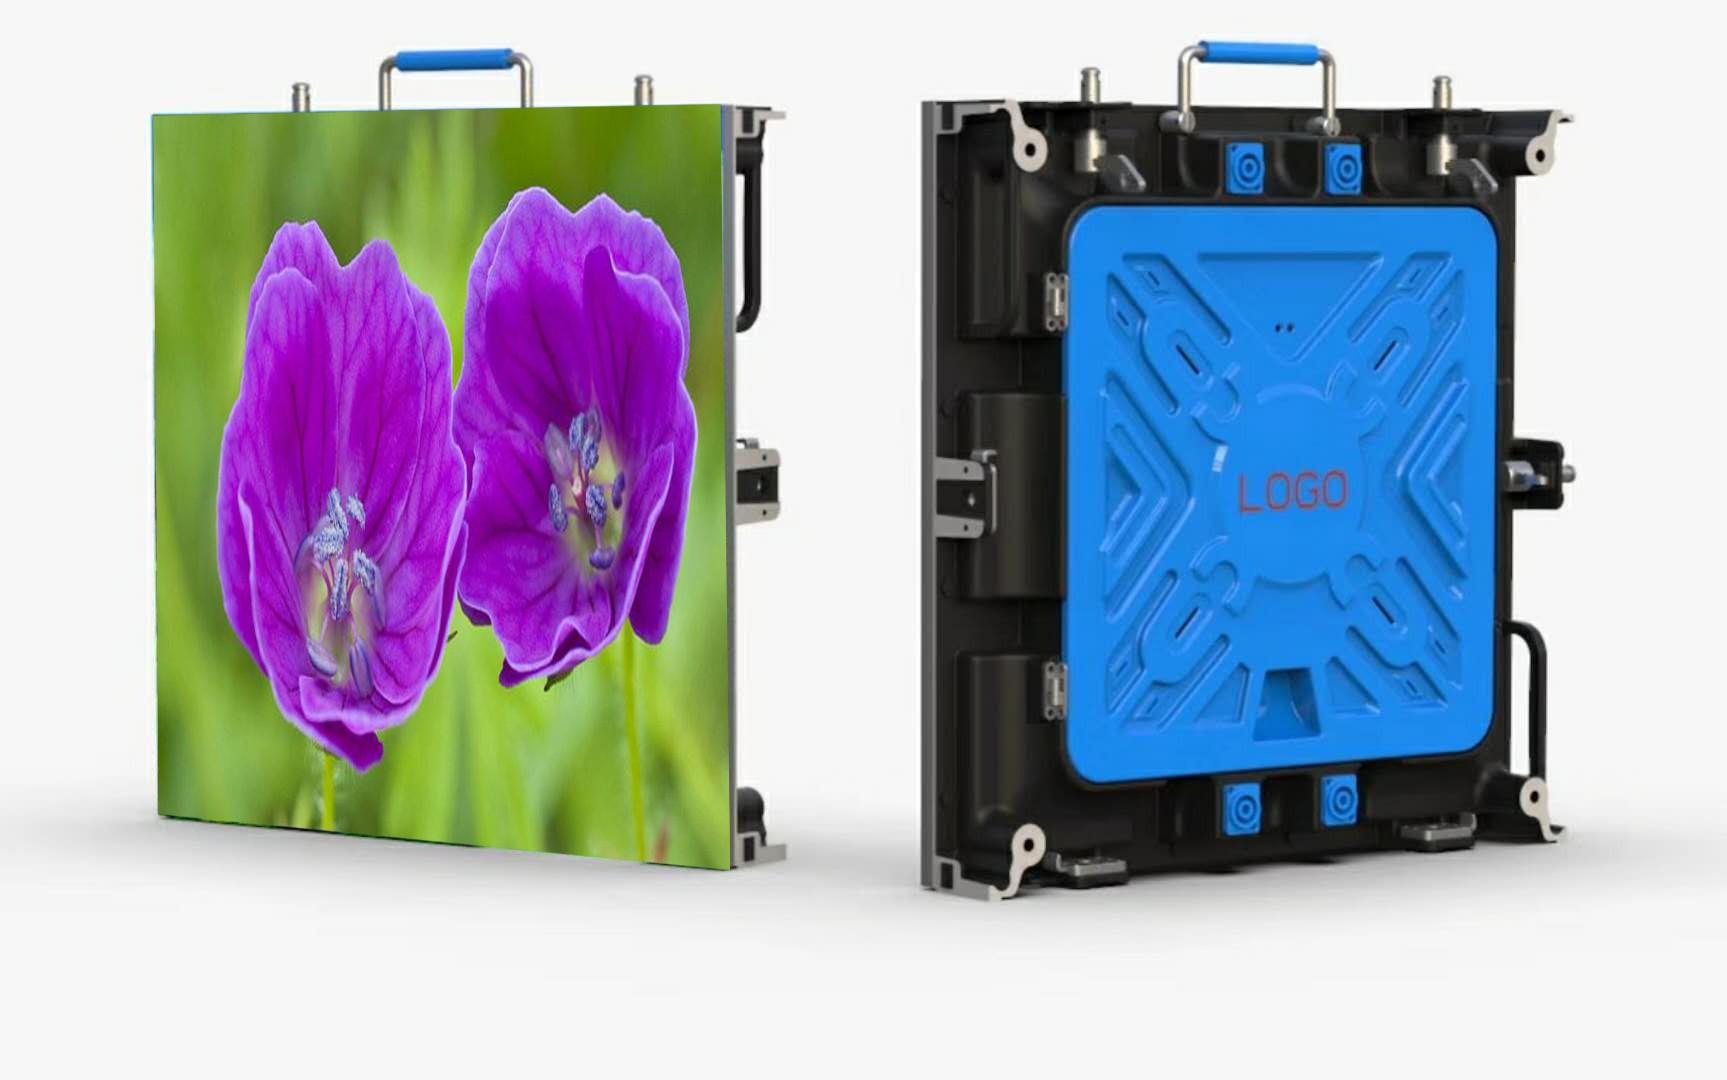 P2.5 indoor led screen Manufacturers, P2.5 indoor led screen Factory, Supply P2.5 indoor led screen